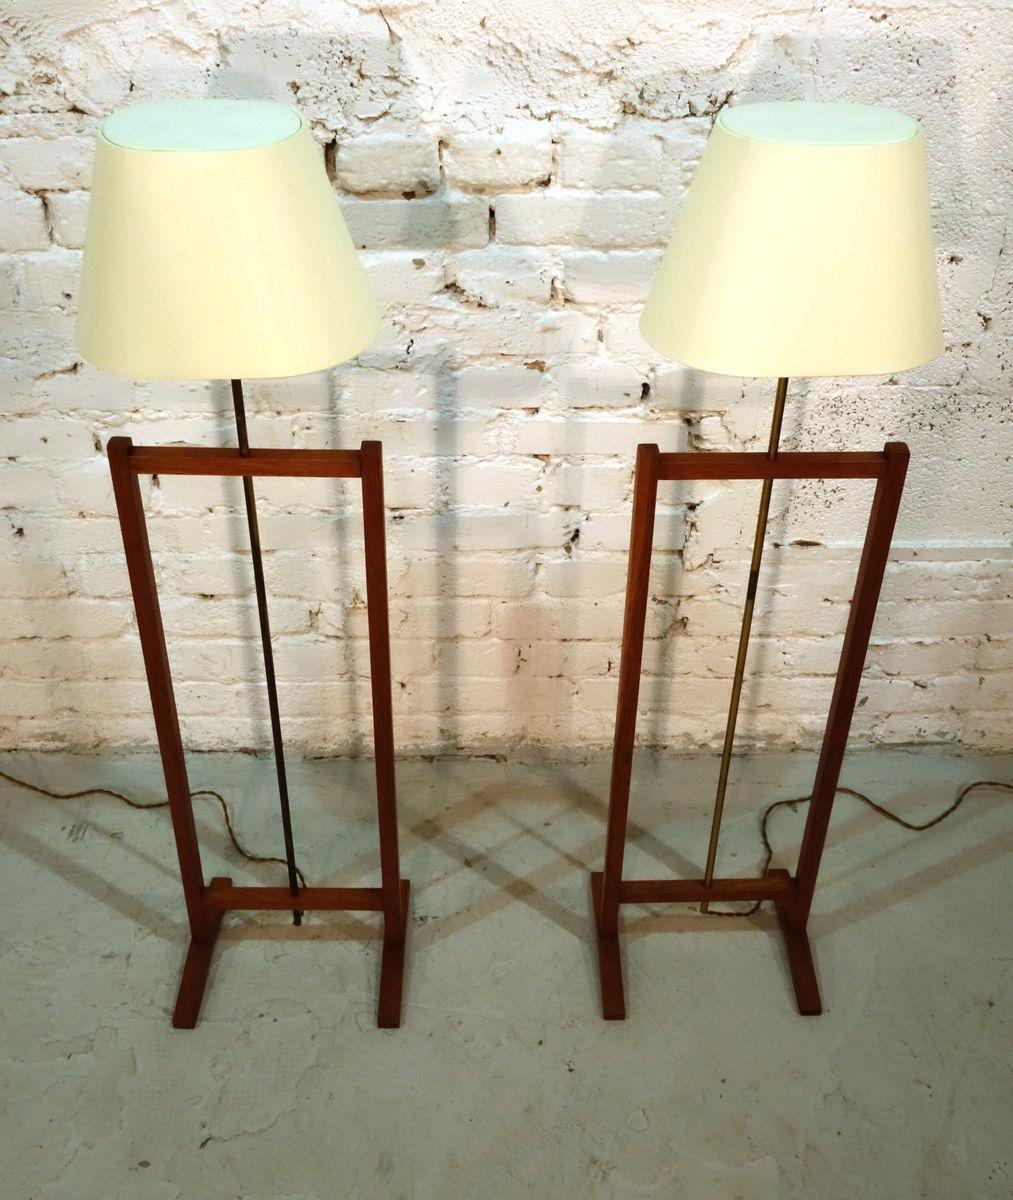 stehlampen von josef frank f r svenskt tenn 1960 2er set bei pamono kaufen. Black Bedroom Furniture Sets. Home Design Ideas